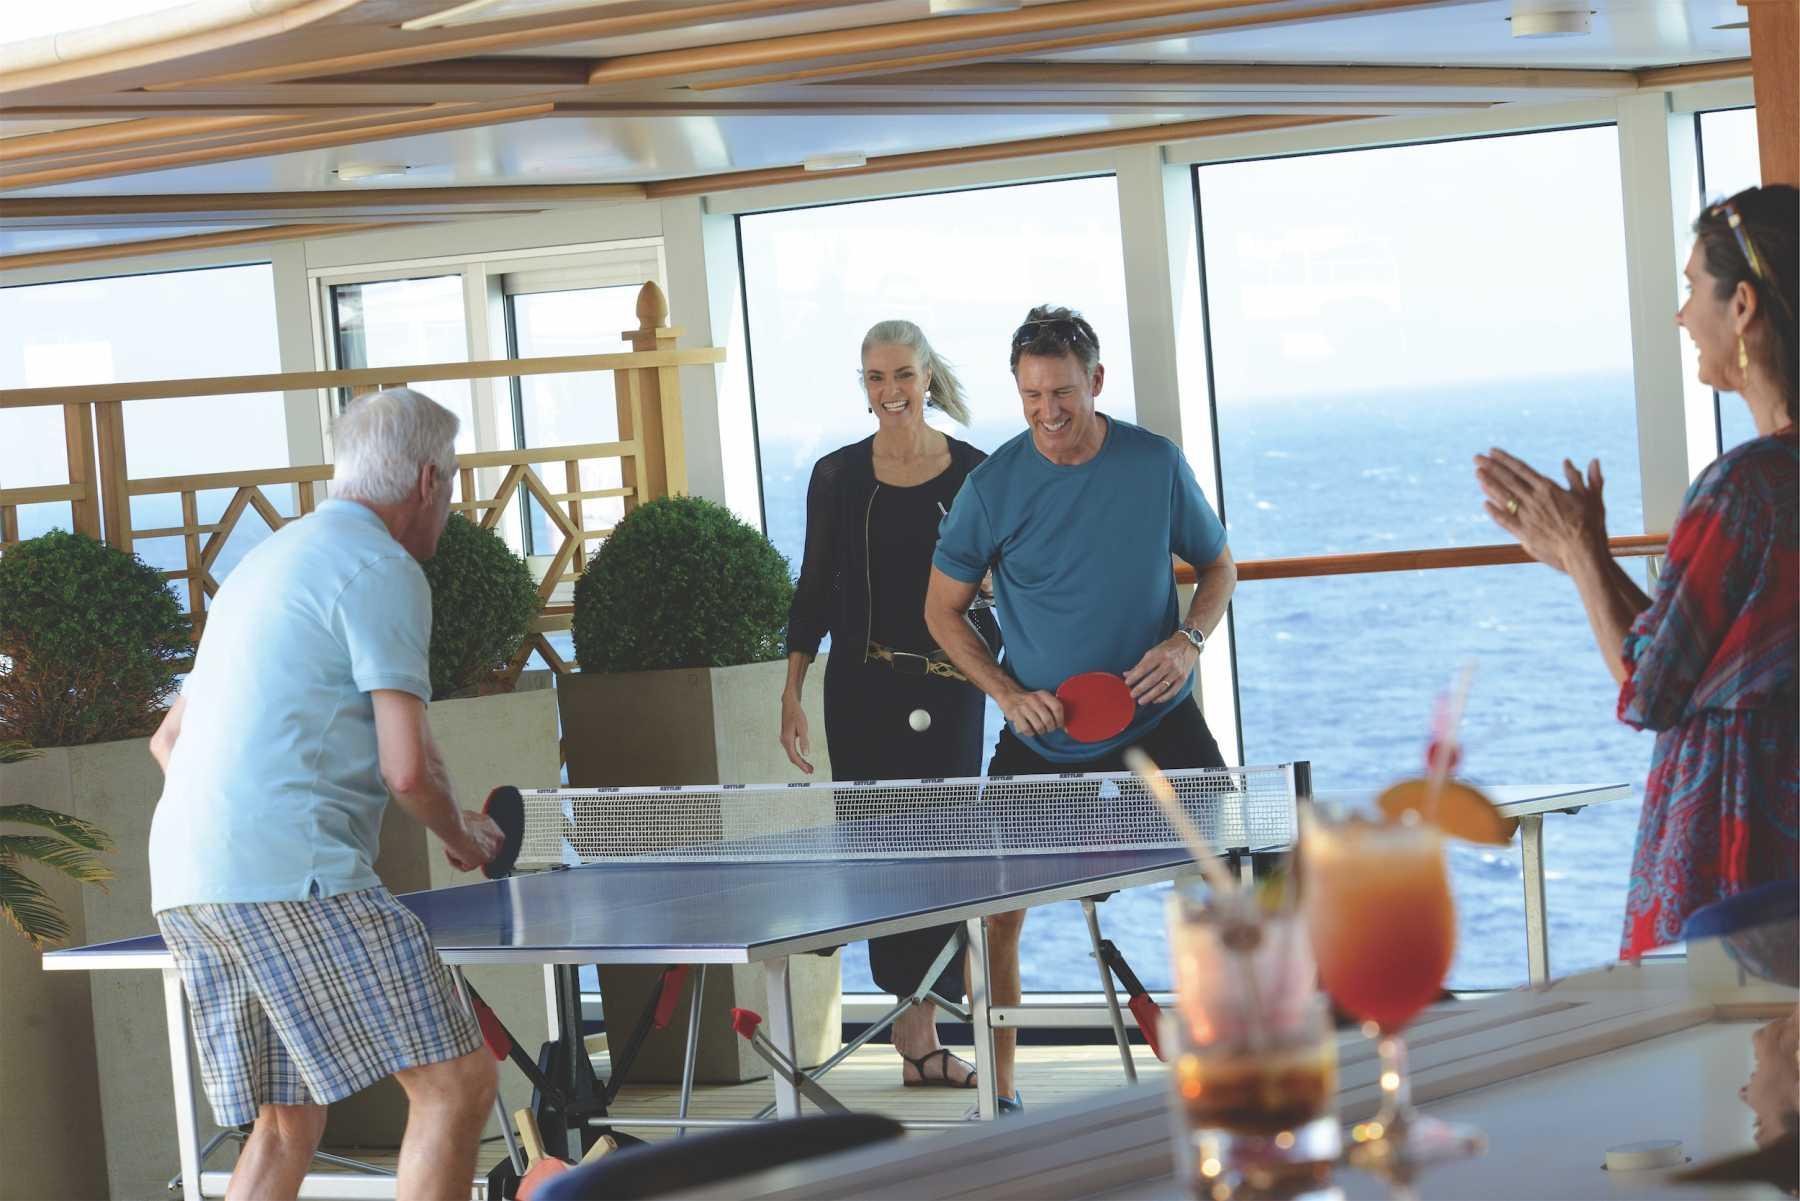 Oceania Cruises Oceania Class Interior Ping Pong.jpg